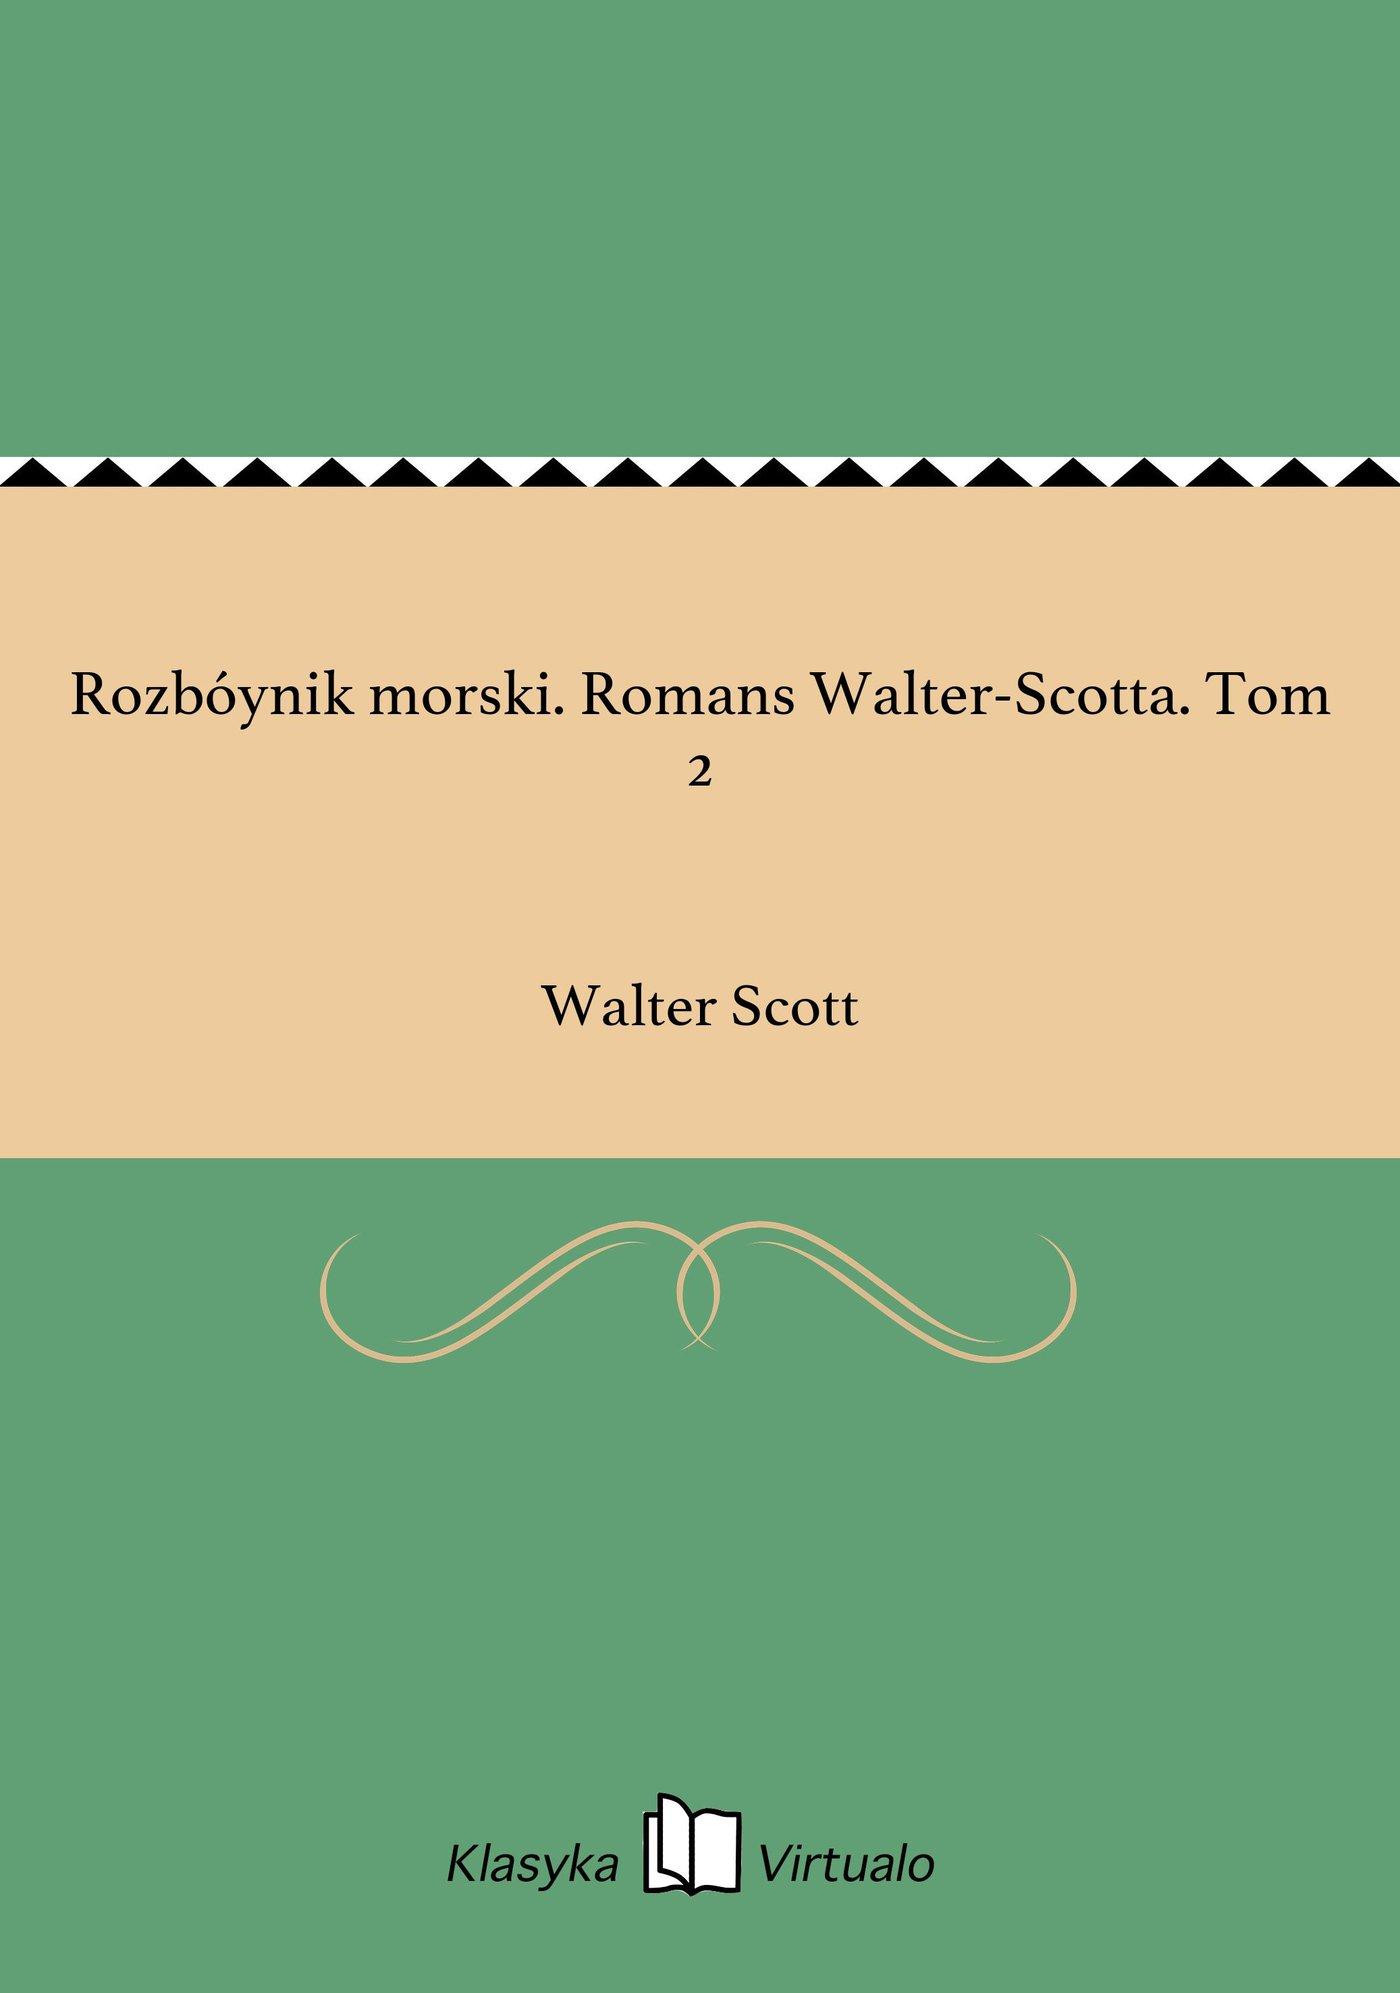 Rozbóynik morski. Romans Walter-Scotta. Tom 2 - Ebook (Książka EPUB) do pobrania w formacie EPUB